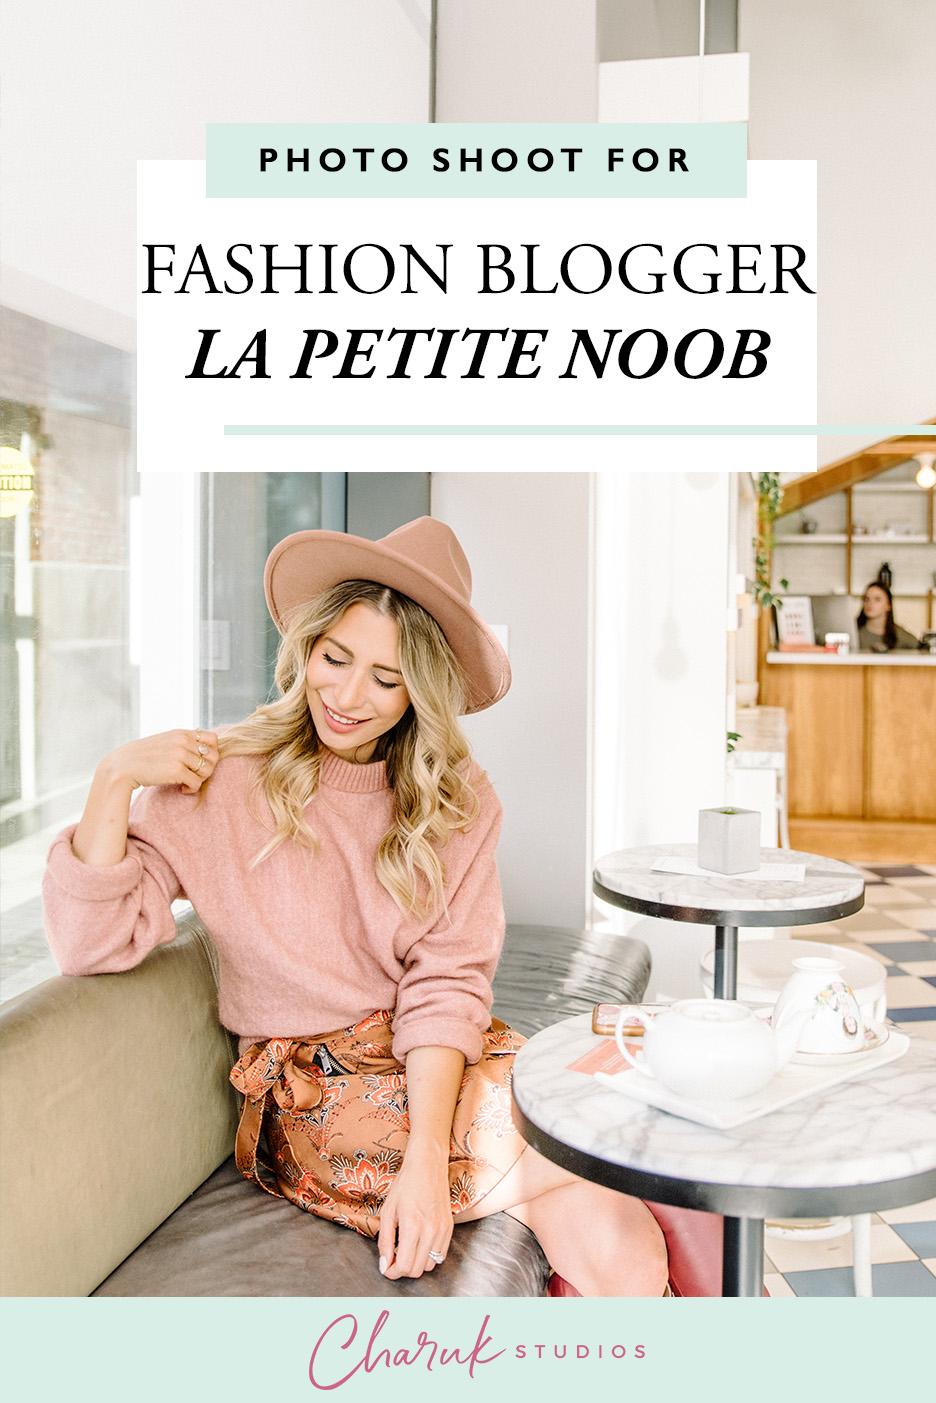 La Petite Noob shoot.jpg